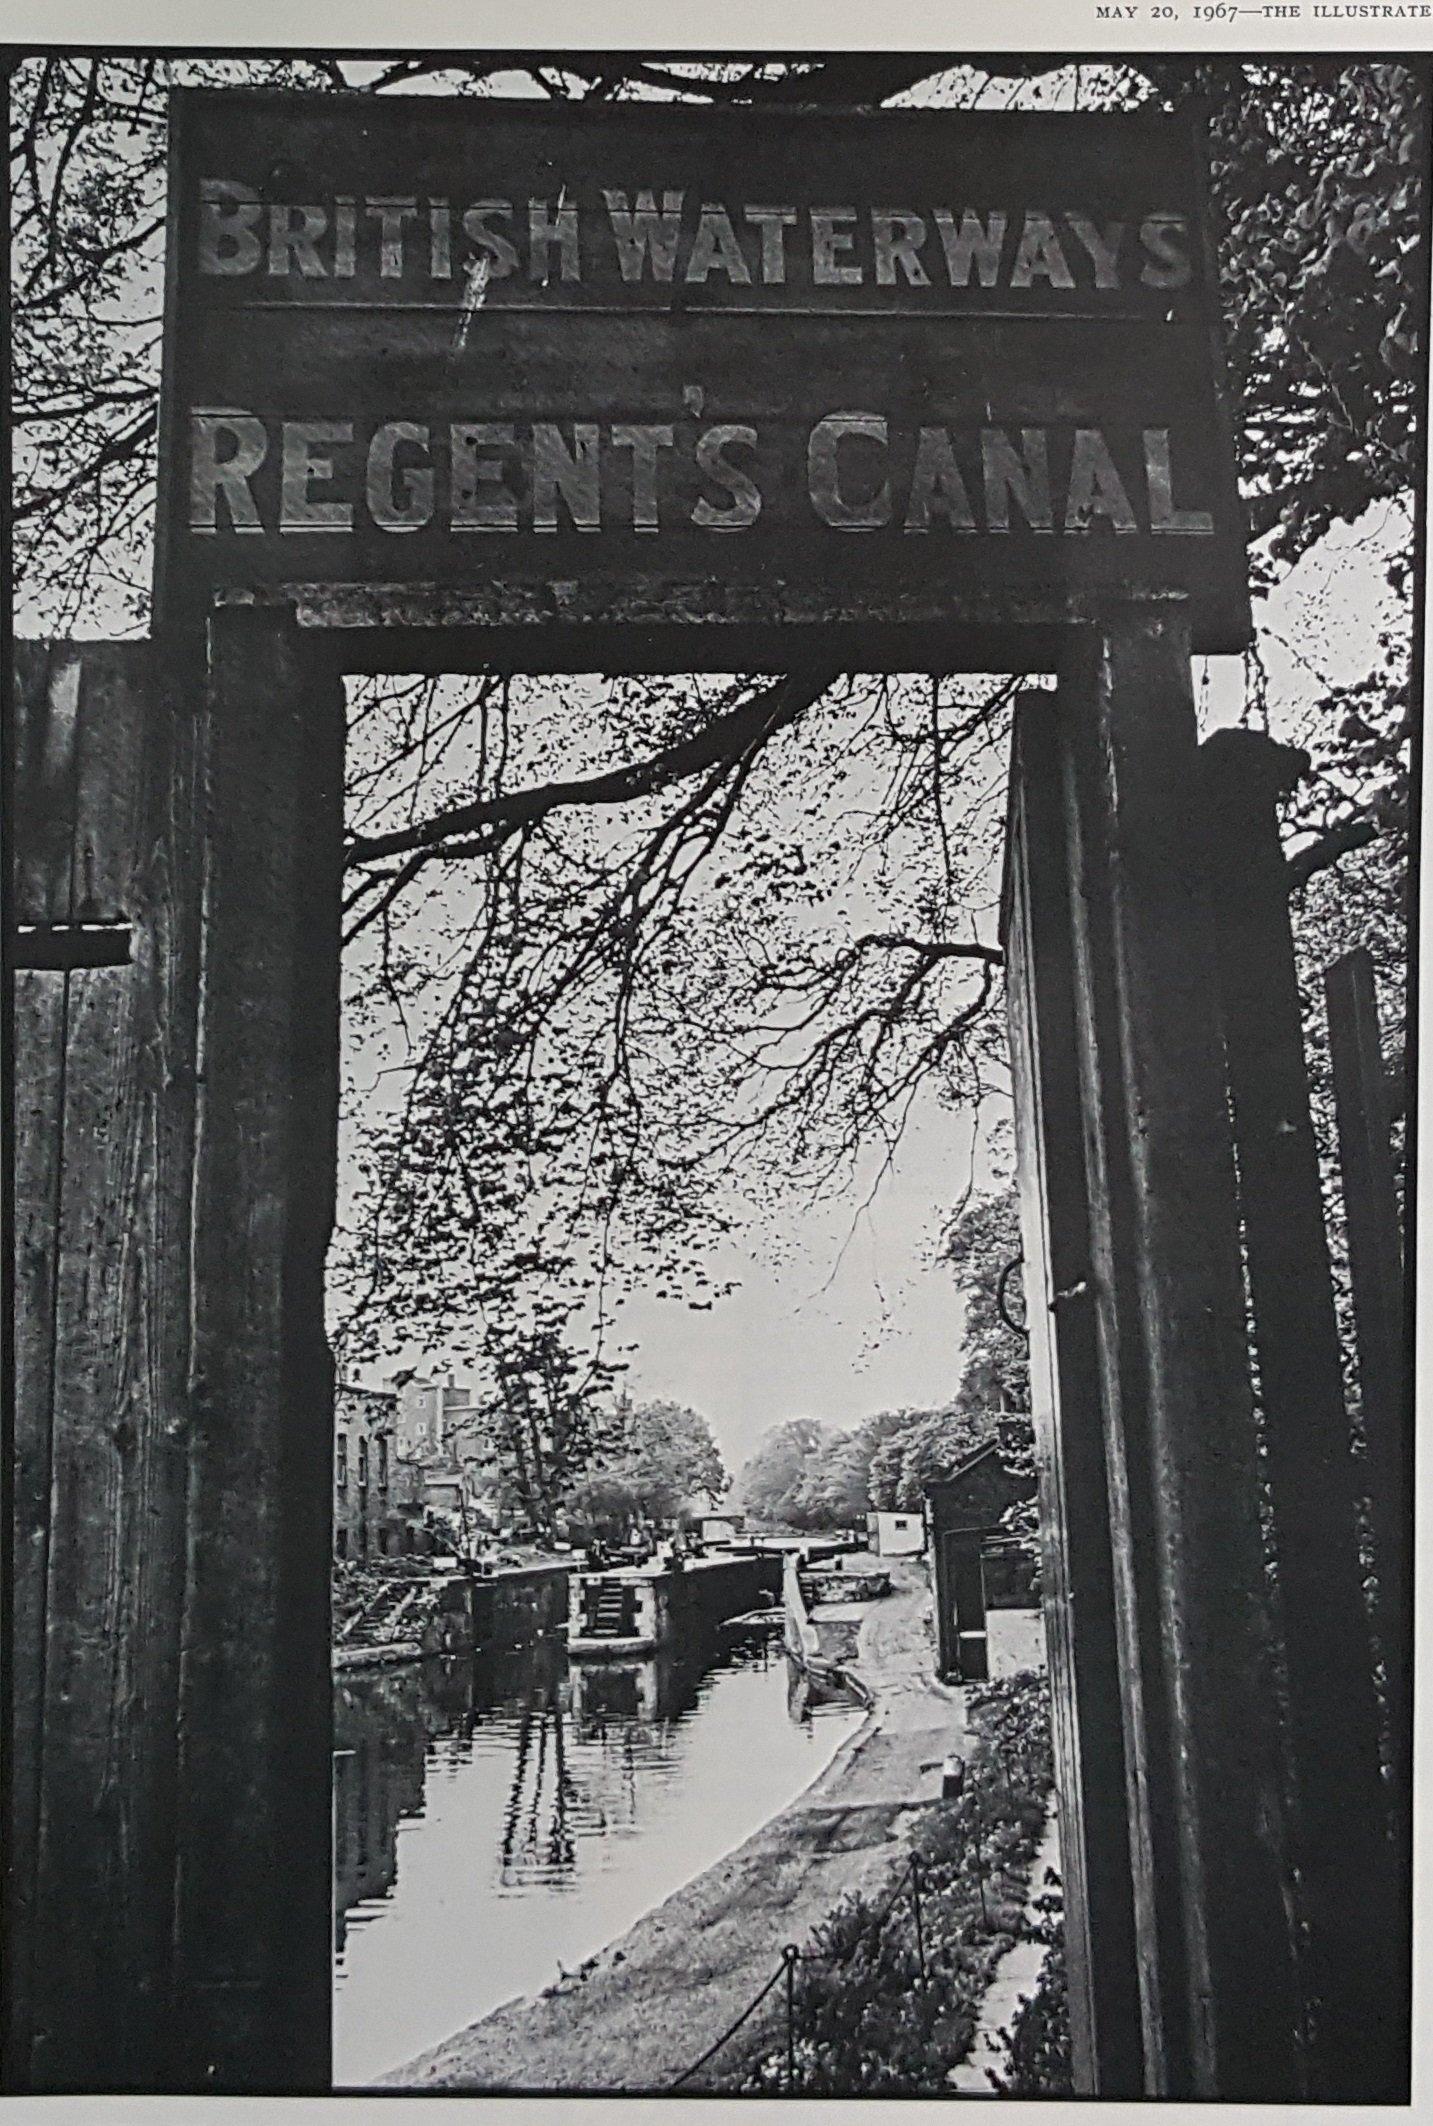 EPoSOwOWAAEN8WN?format=jpg&name=4096x4096 - Regent's Canal 200th